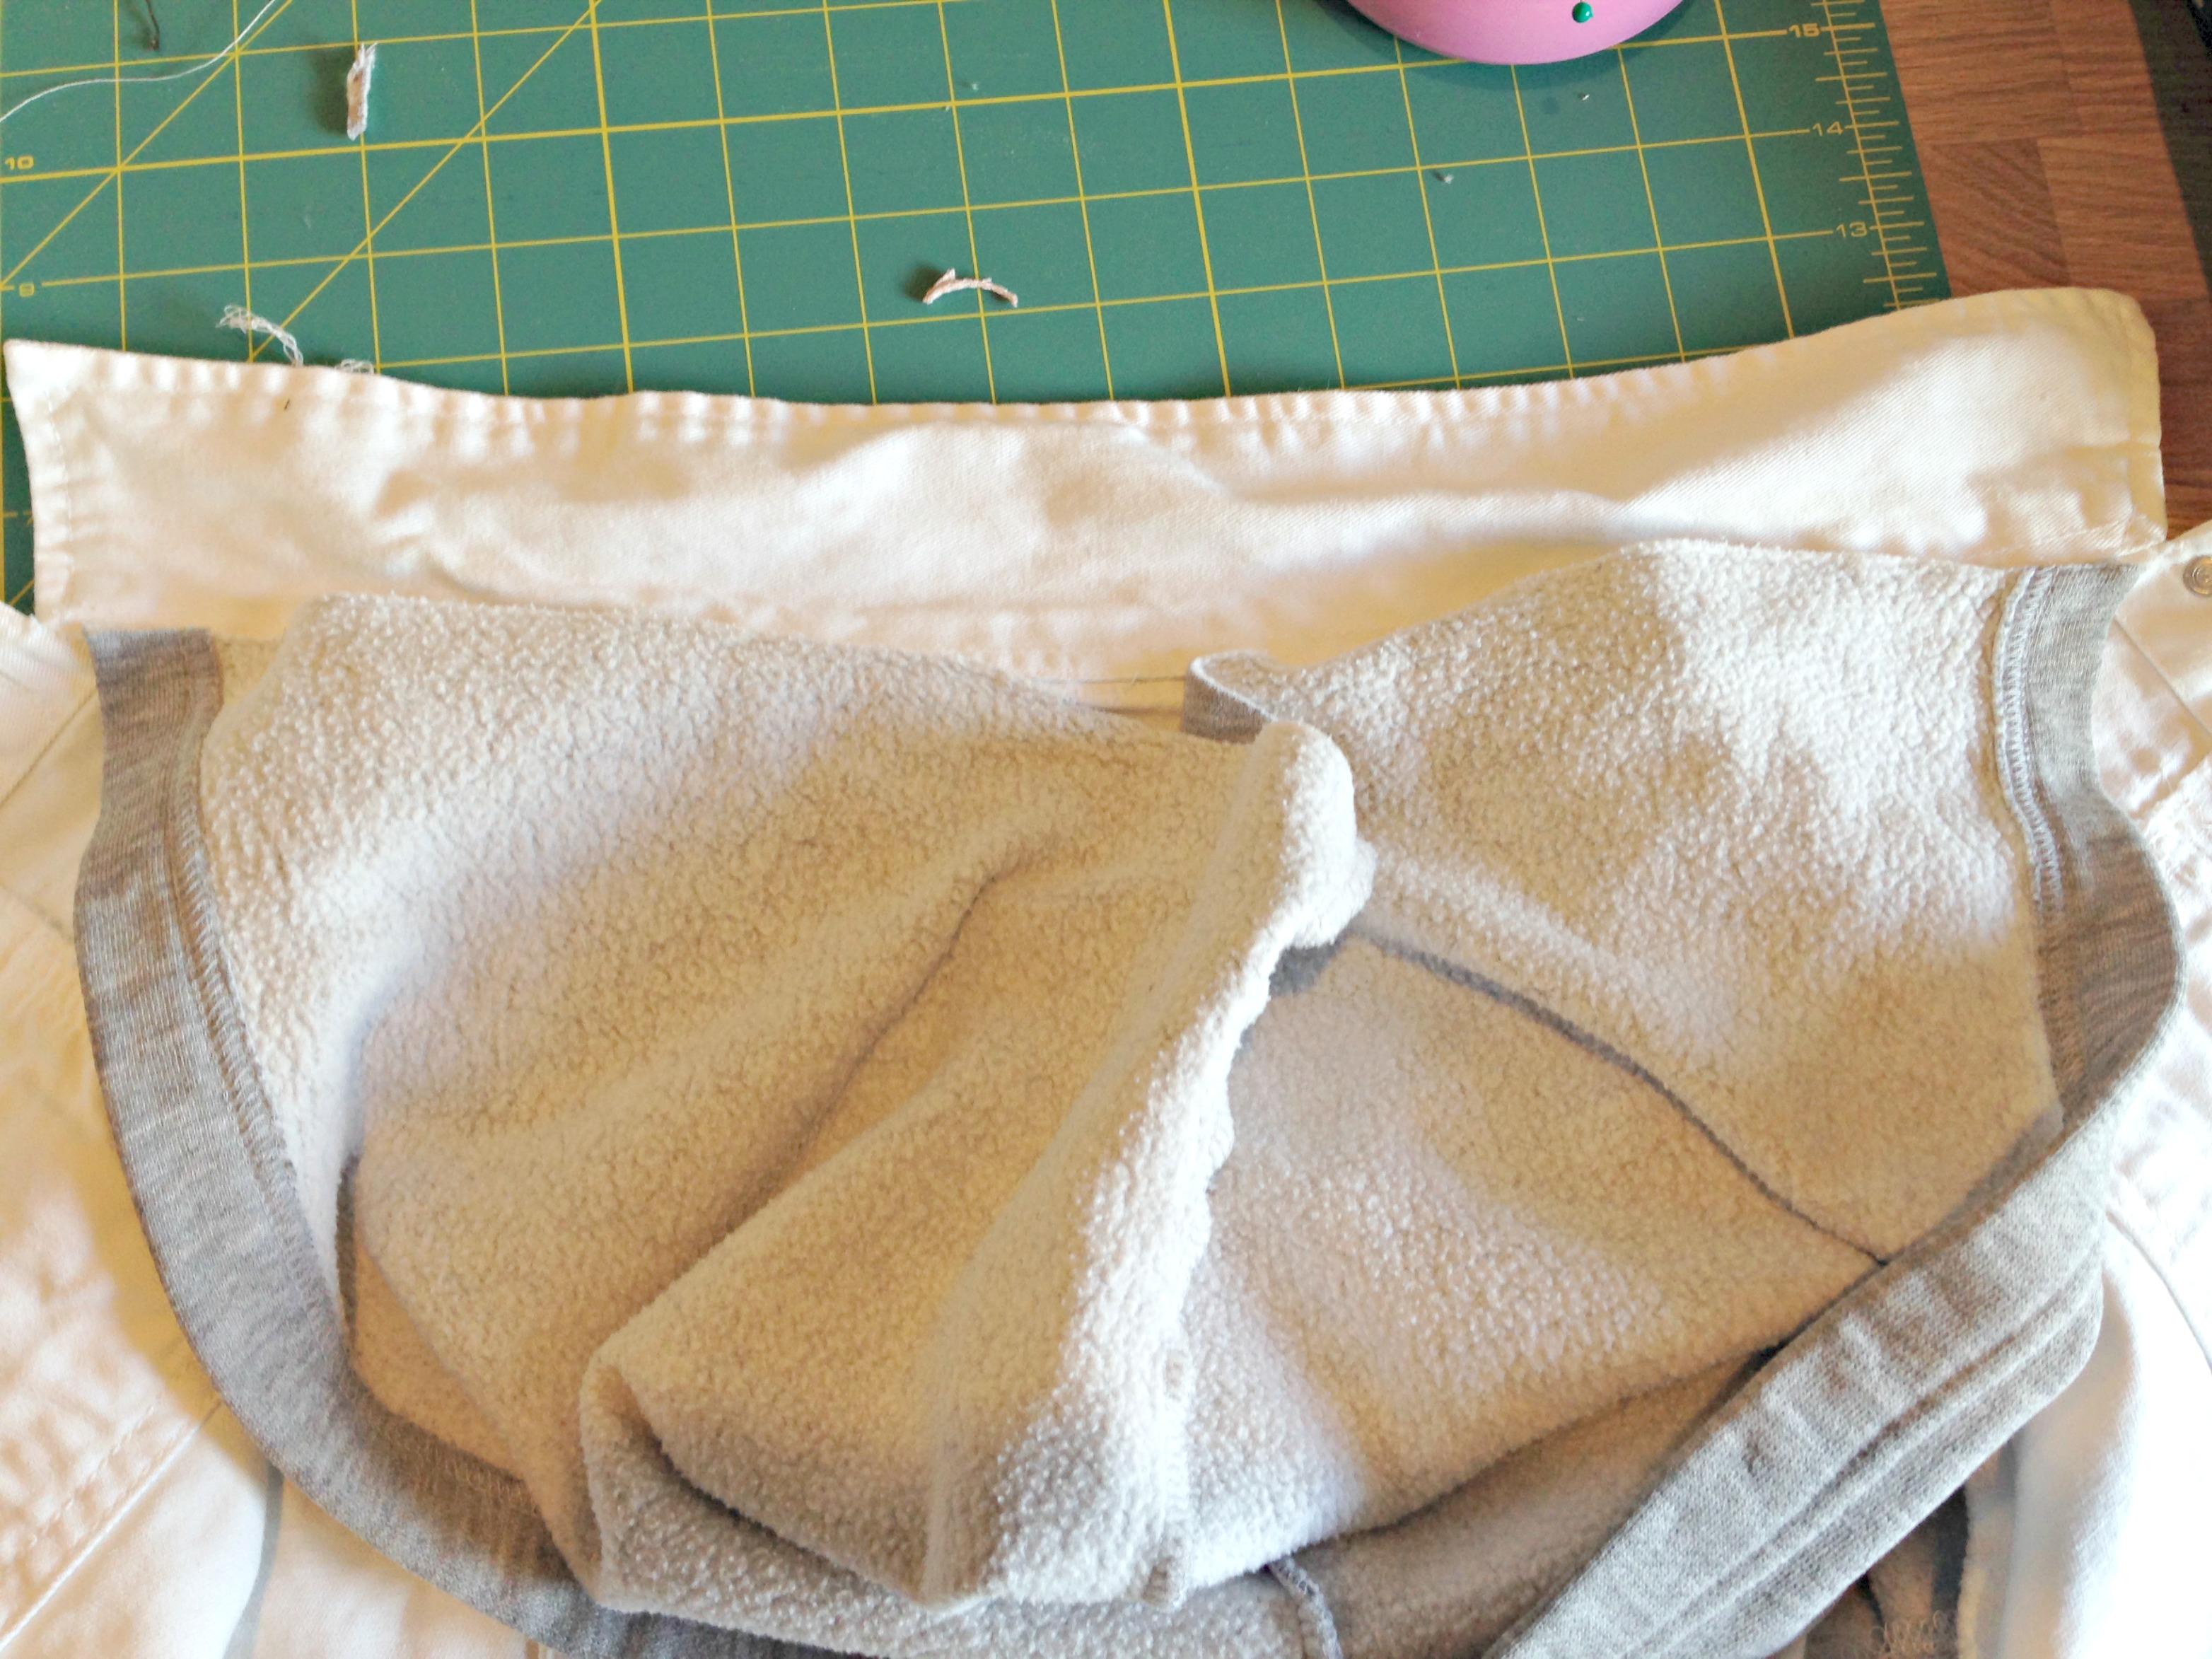 Refashioned Jean Jacket with Sweatshirt Sleeves and Hoodie - resize the hoodie